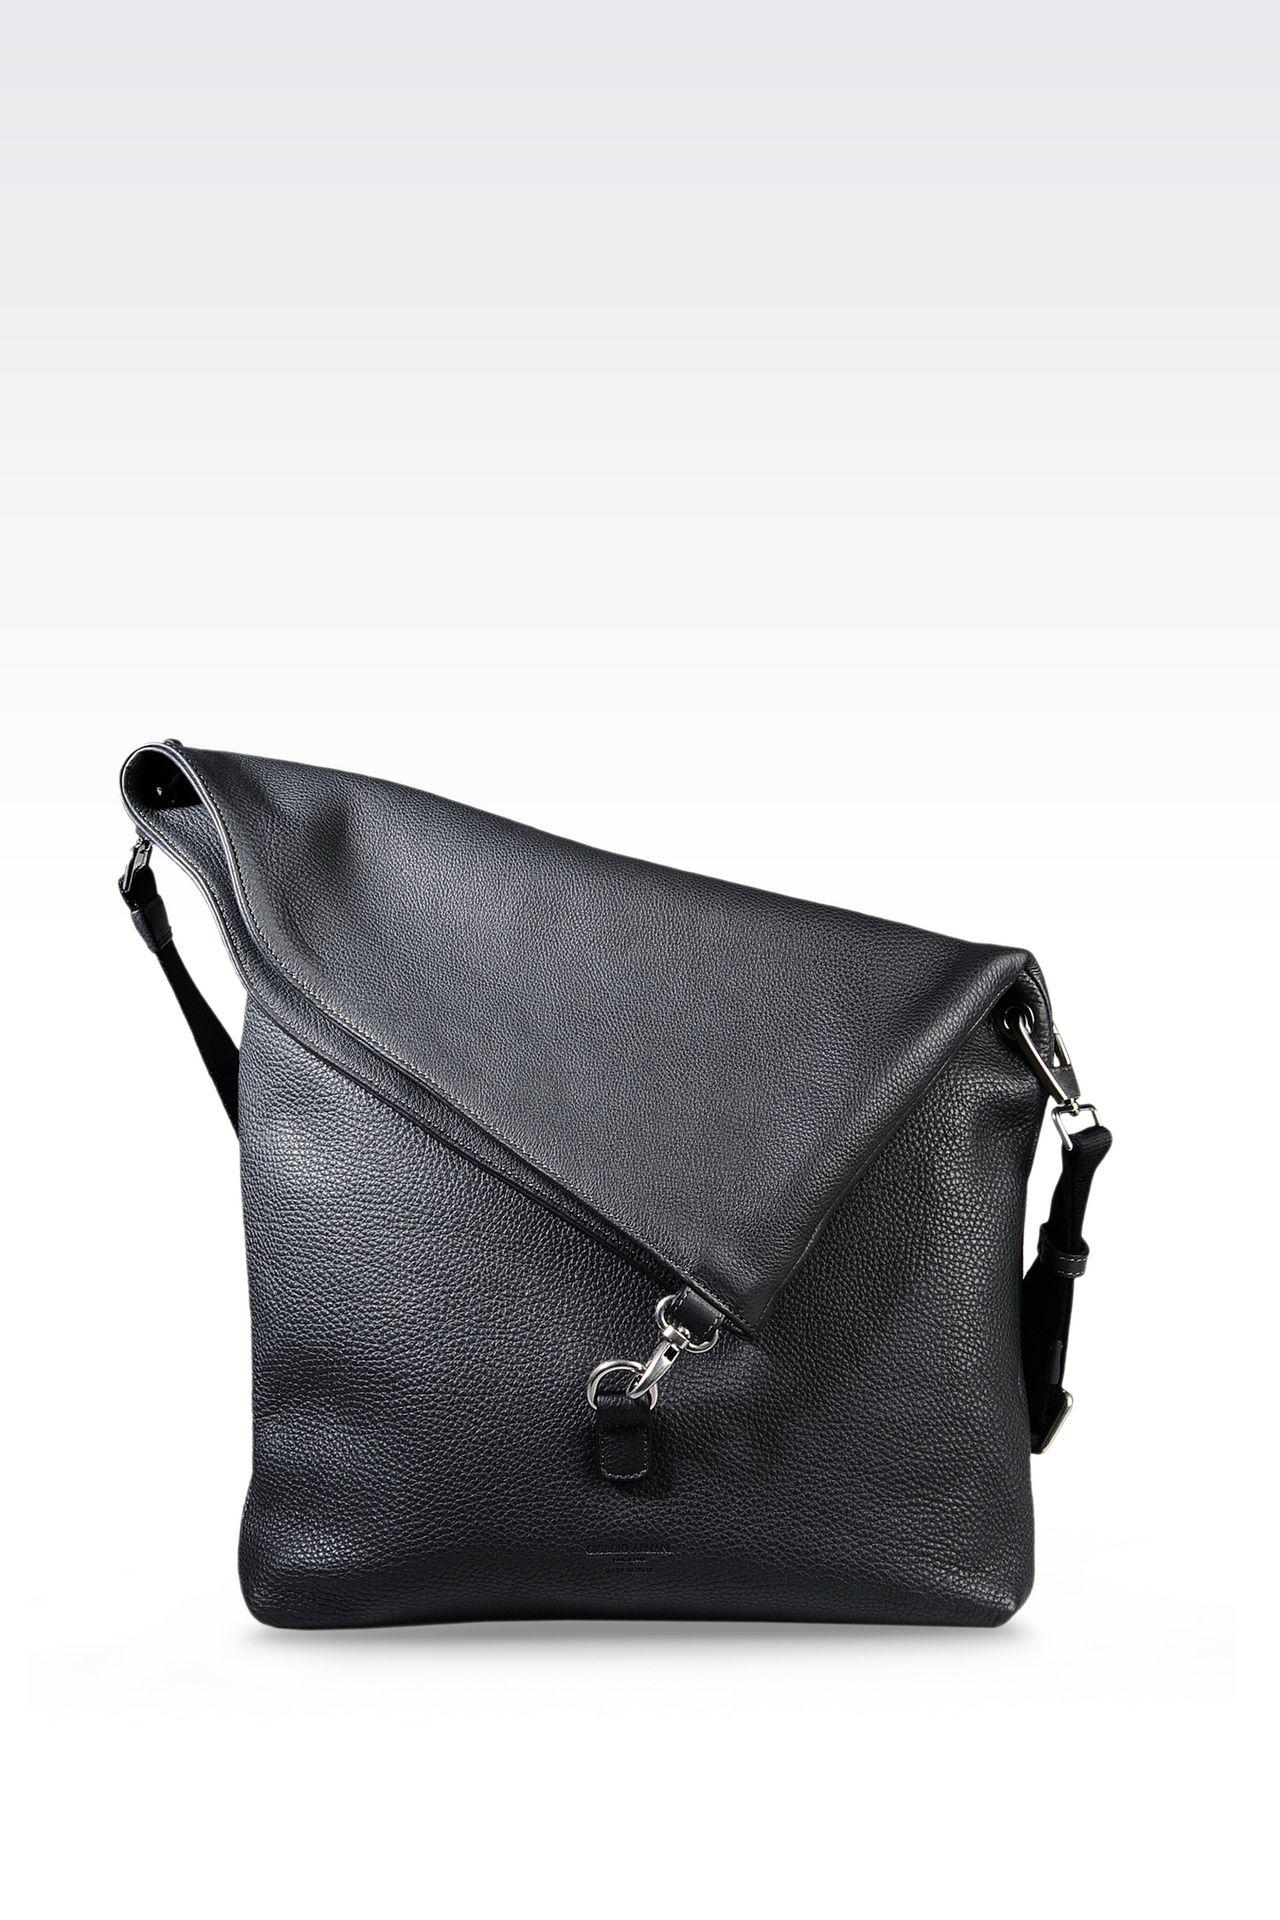 SHOULDER BAG IN PRINTED CALFSKIN: Messenger bags Men by Armani - 0